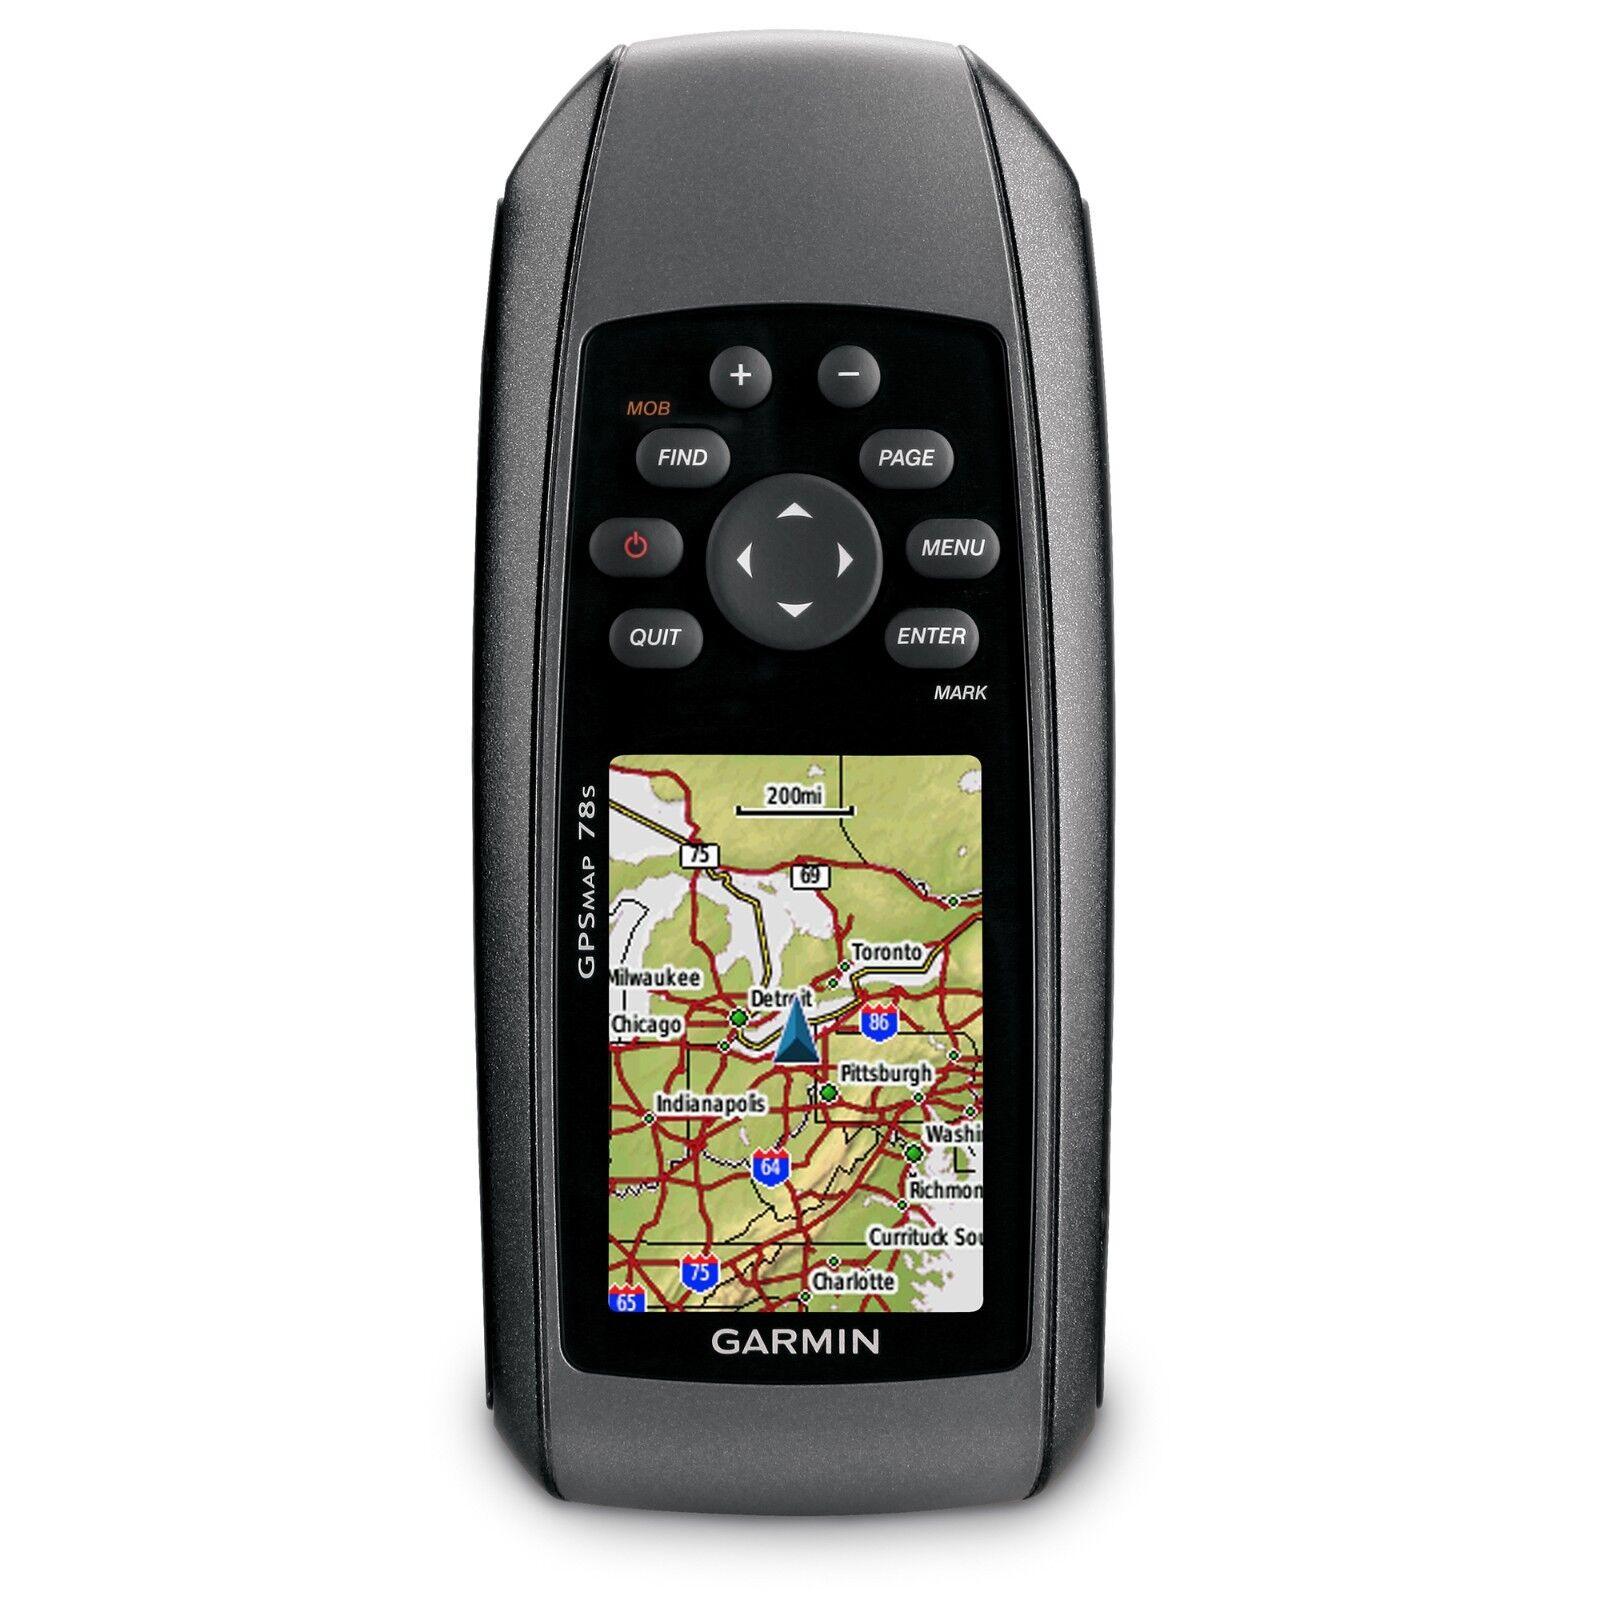 Garmin Gpsmap 78s 78s 78s Marine Handheld GPS 010-00864-01 - Brandneu 18422e